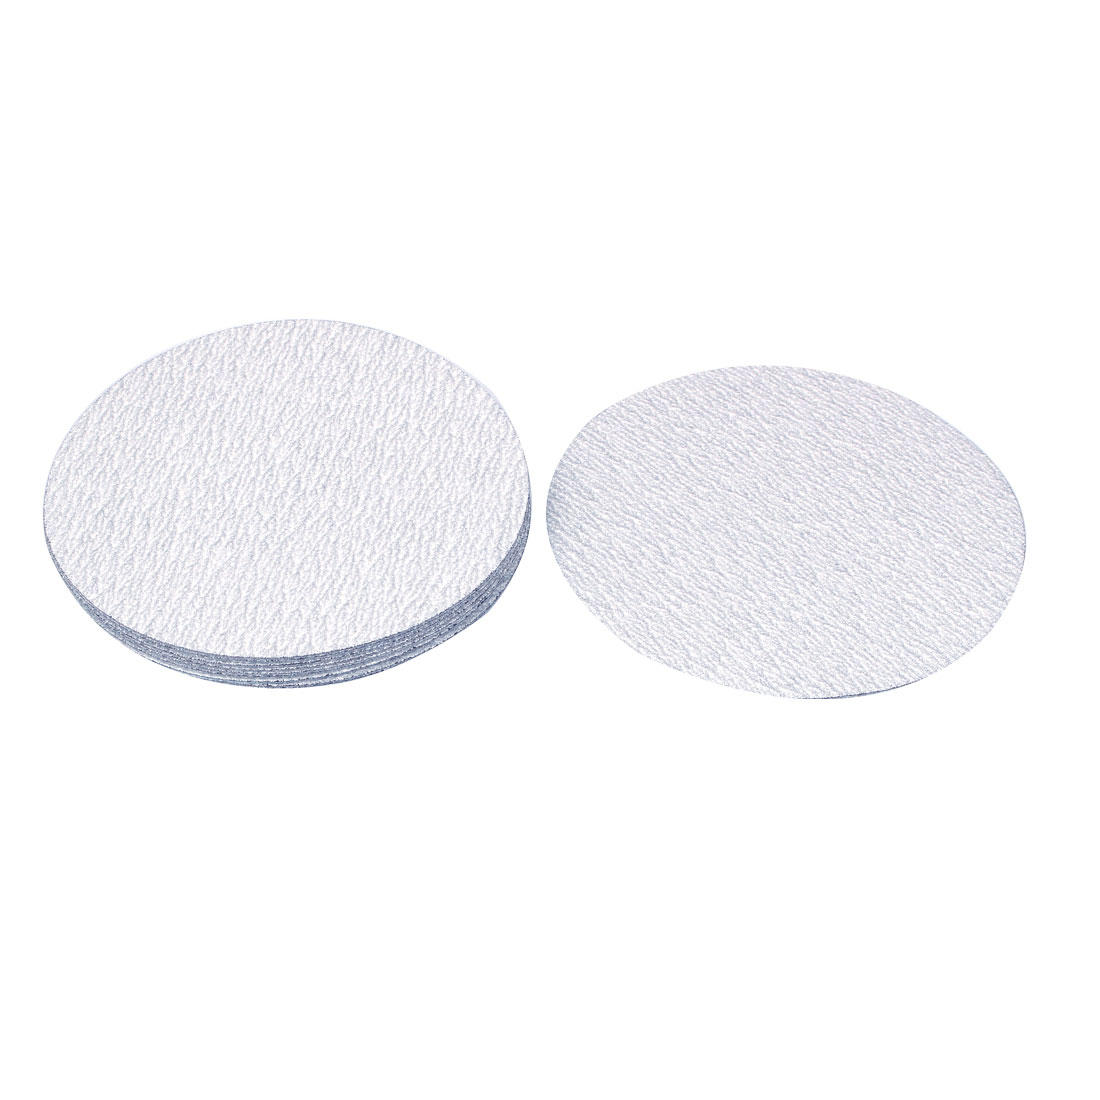 "5"" Dia Dry Abrasive Sanding Sandpaper Sheet Disc 240 Grit 10 Pcs"